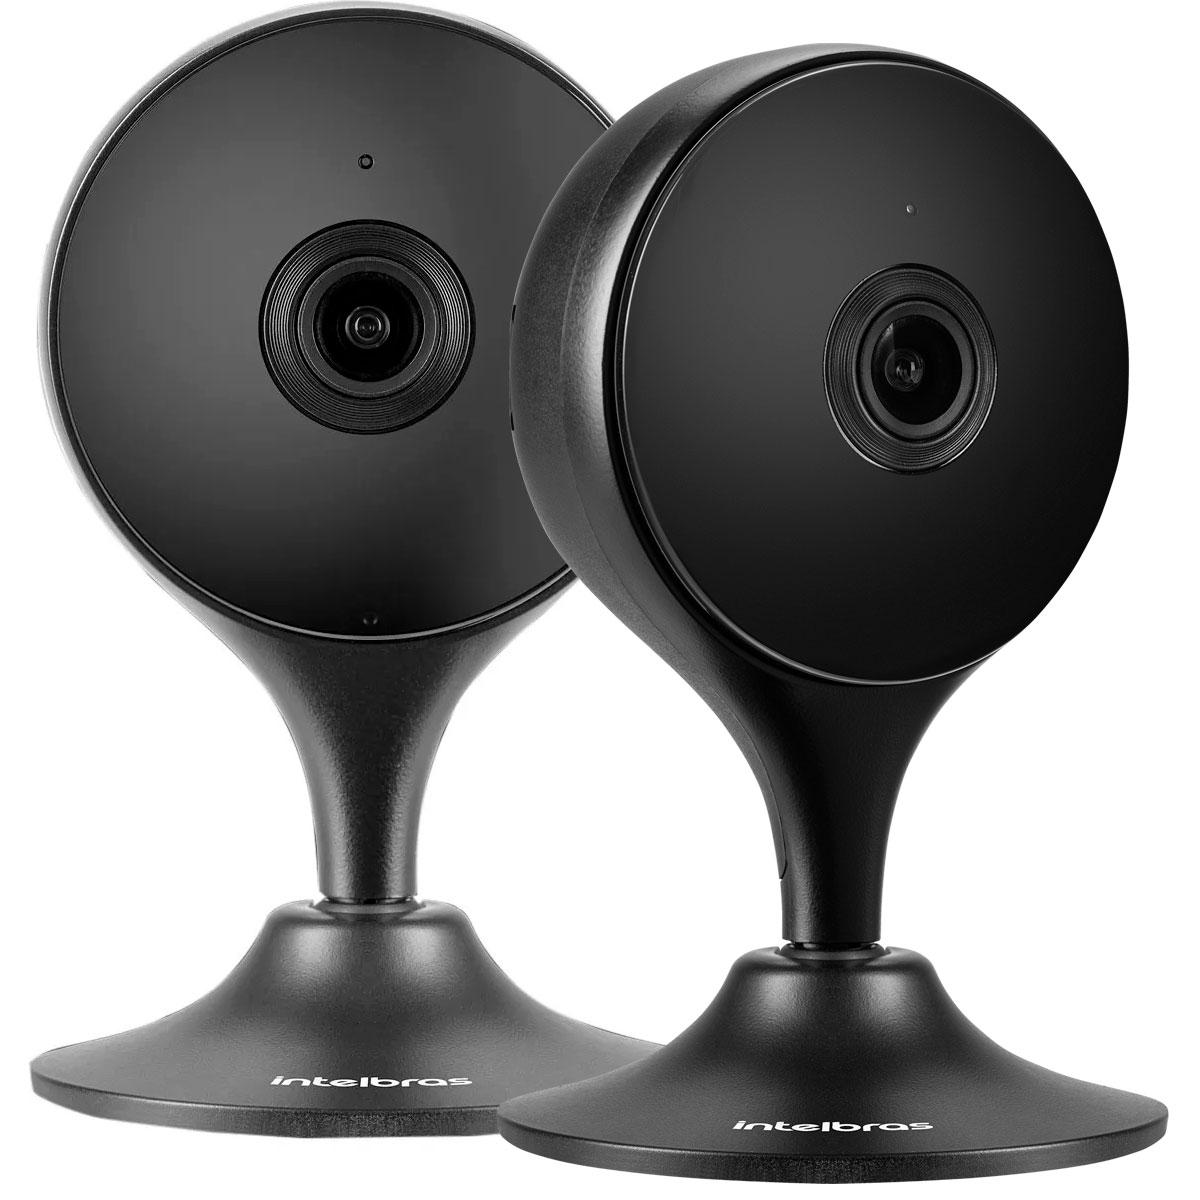 kit-2-cameras-com-inteligencia-artificial-full-hd-im3-intelbras-preta-1-nvr-stand-alone-04-canais-6mp-nvd-1304-intelbras-1-hd-interno-wd-purple-1tb-surveillance-sata-iii-01